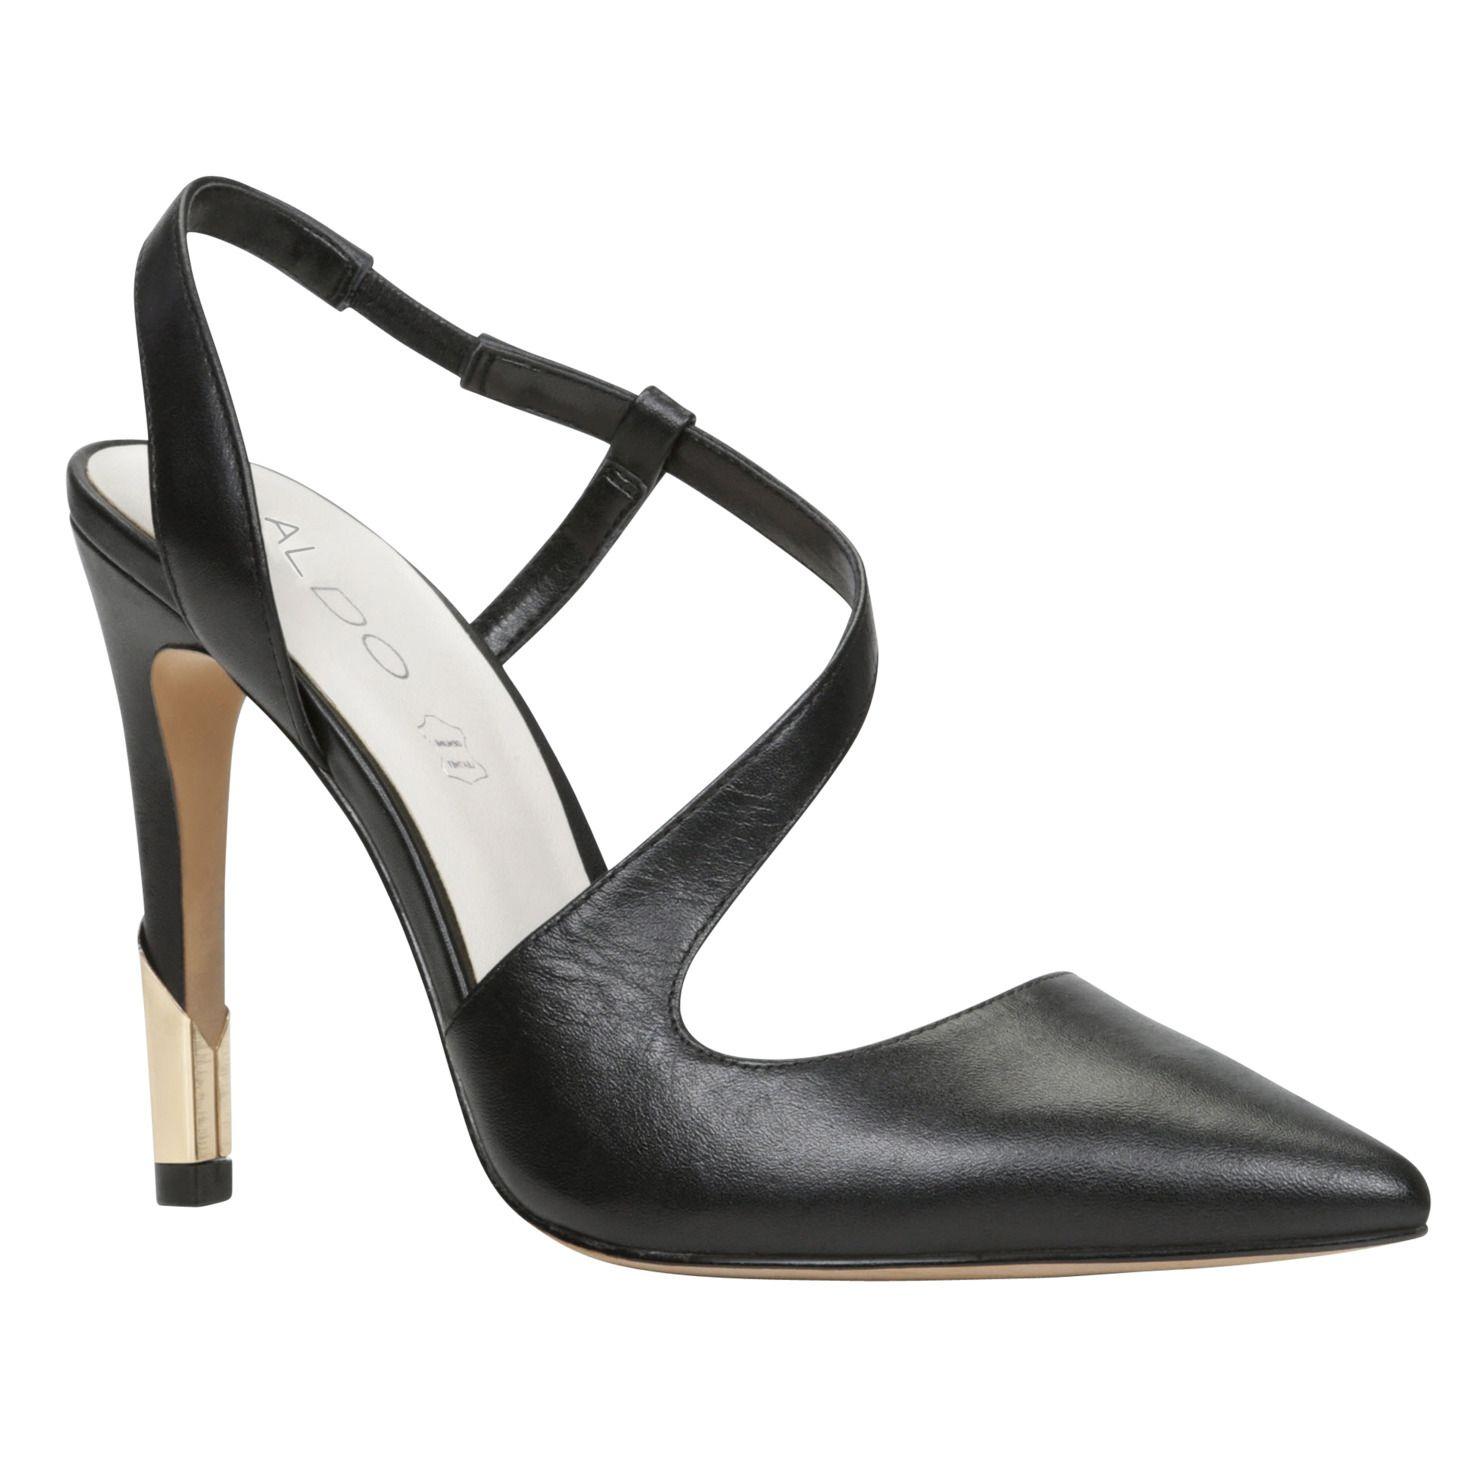 ALDO Shoes.   Womens shoes high heels